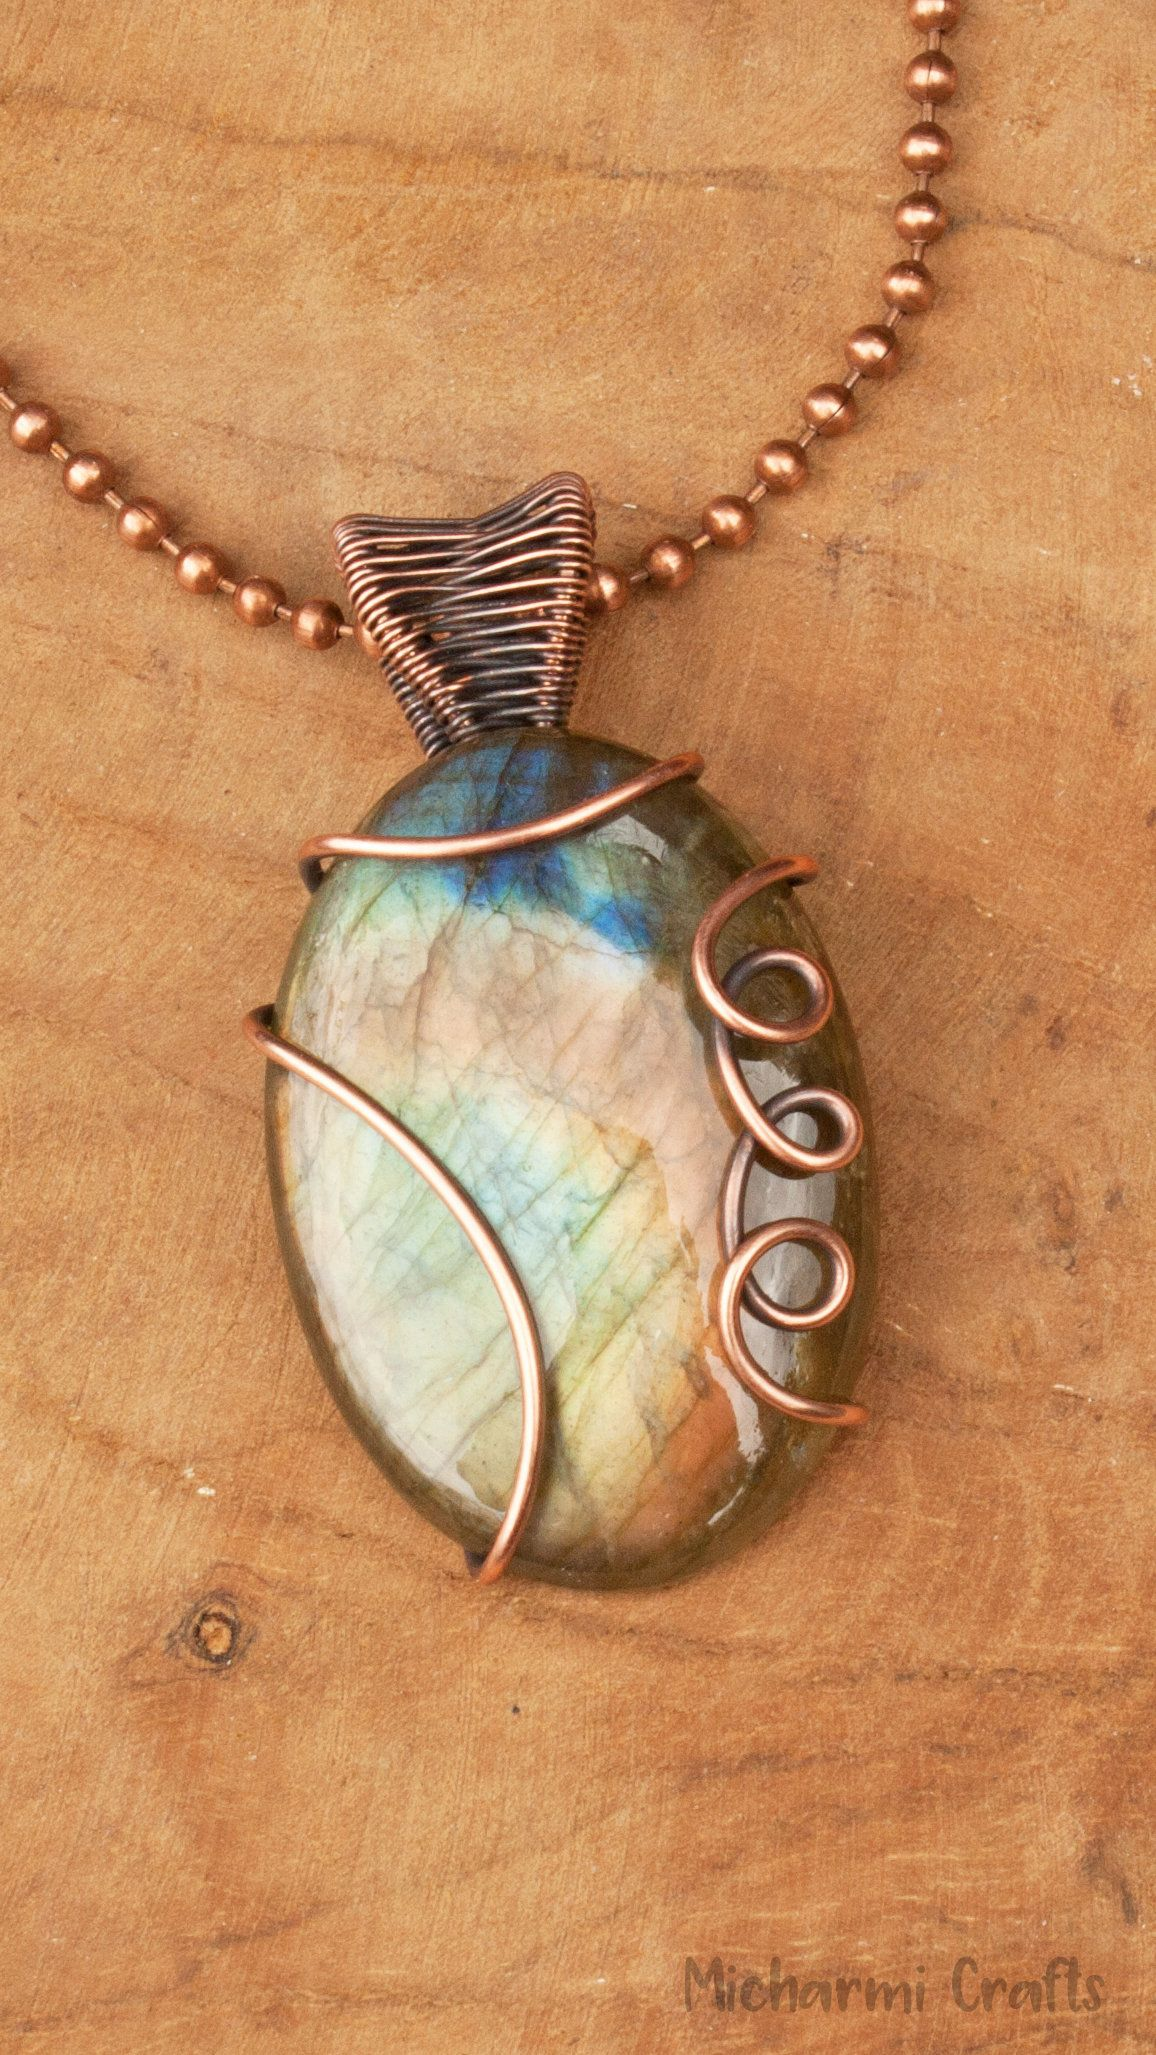 Multicolor Labradorite Stone Pendant Necklace, Copper Wire Wrap Gemstone Jewelry, 7th anniversary gift #gemstonejewelry